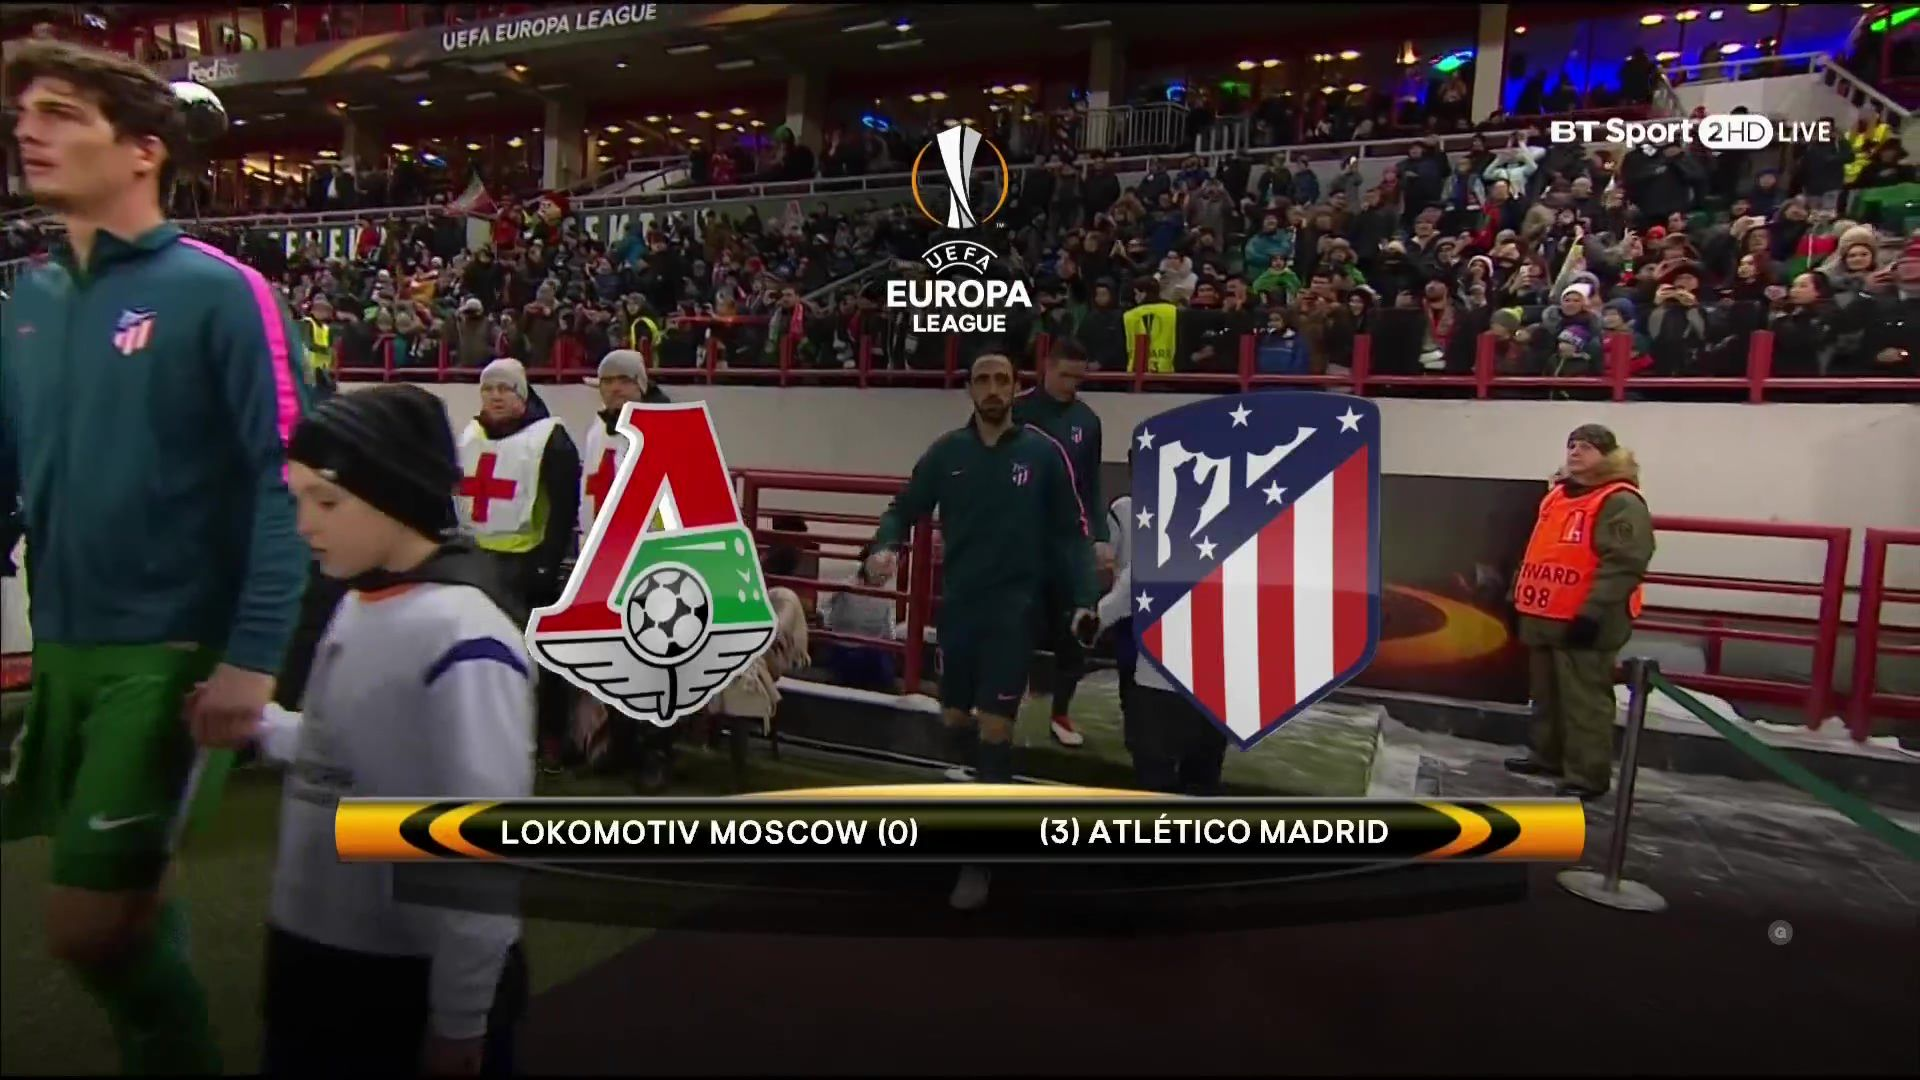 Pin on goals UEL 17/18 R16 2nd leg Lokomotiv Moscow vs